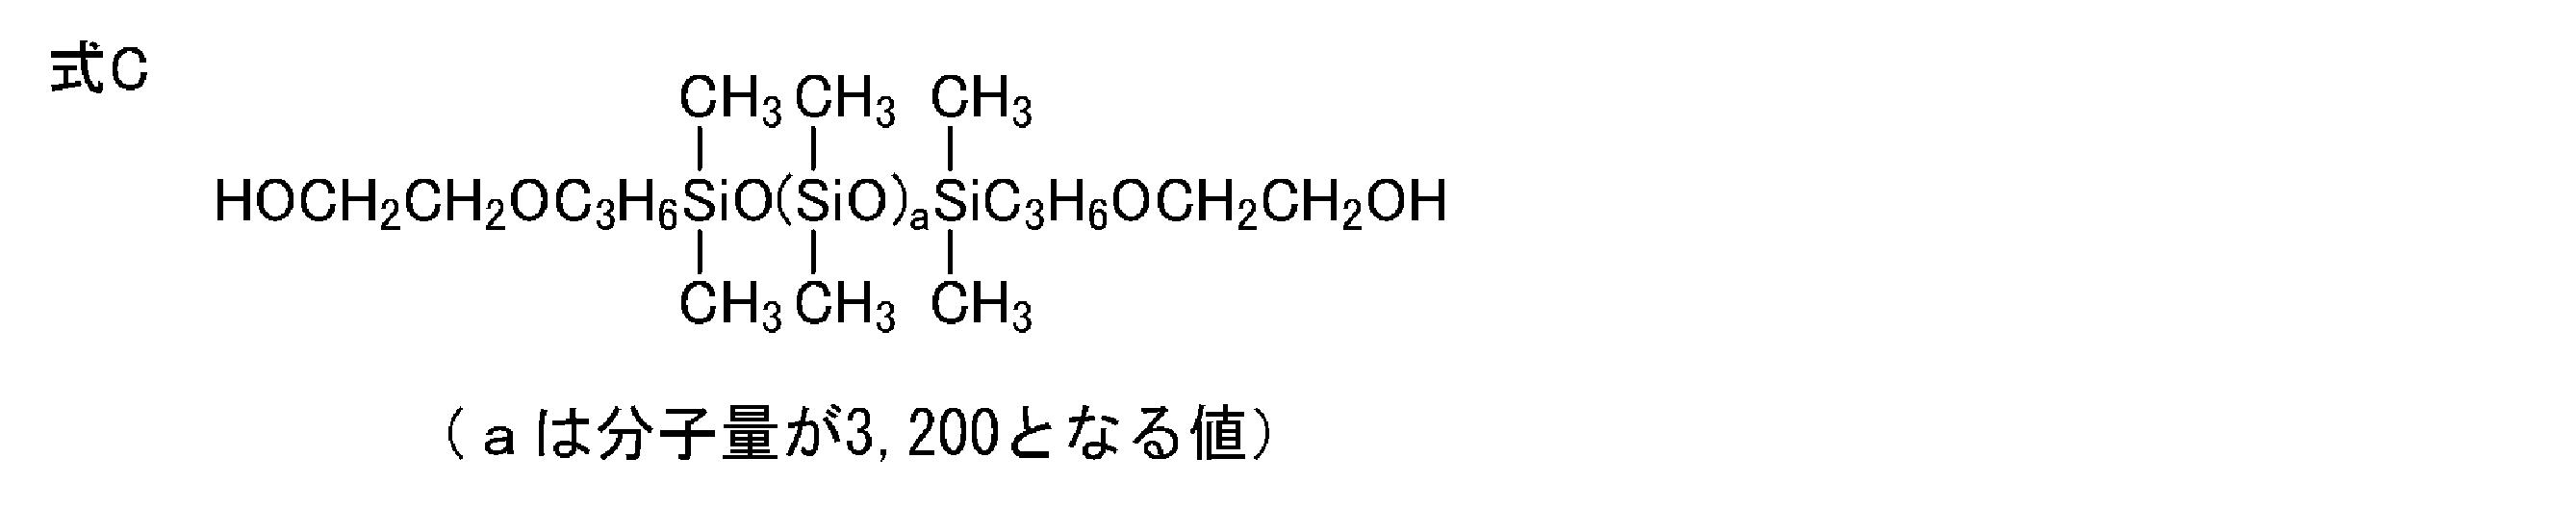 Figure JPOXMLDOC01-appb-I000022